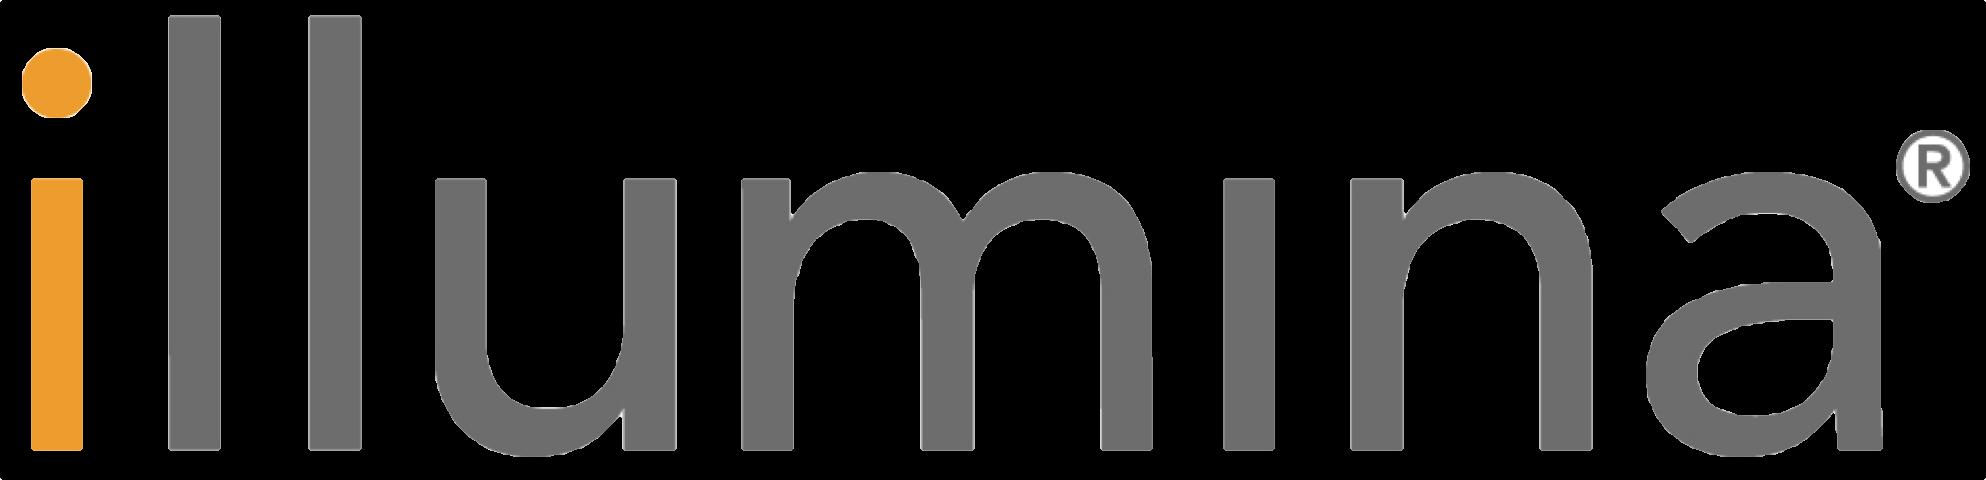 logotipo de illumina